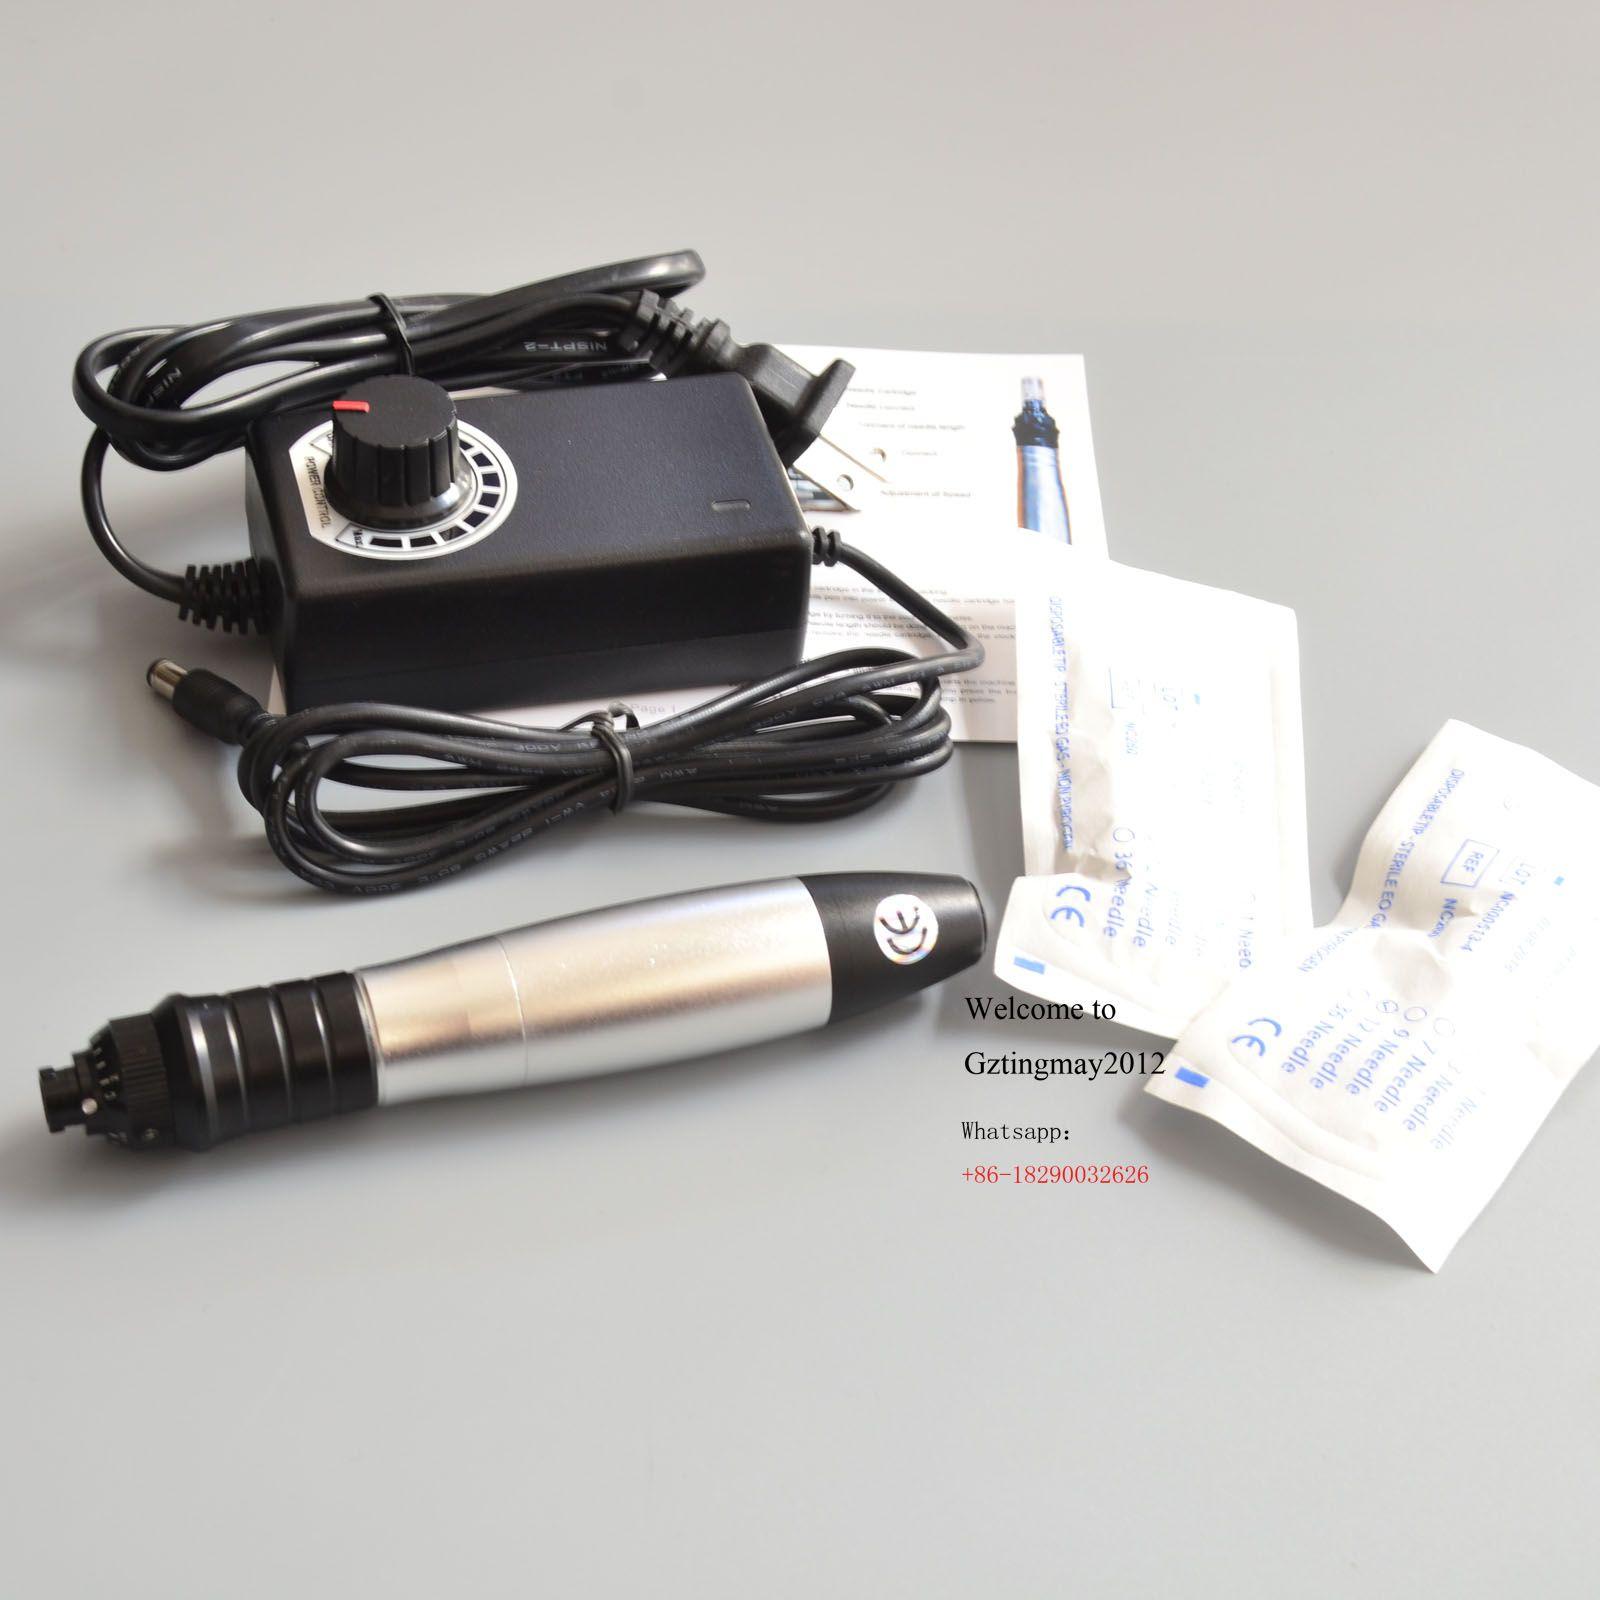 MYM Electrical Derma Pen elétrica Derma Stamp rolo Micro Agulha com 12pcs agulha do cartucho